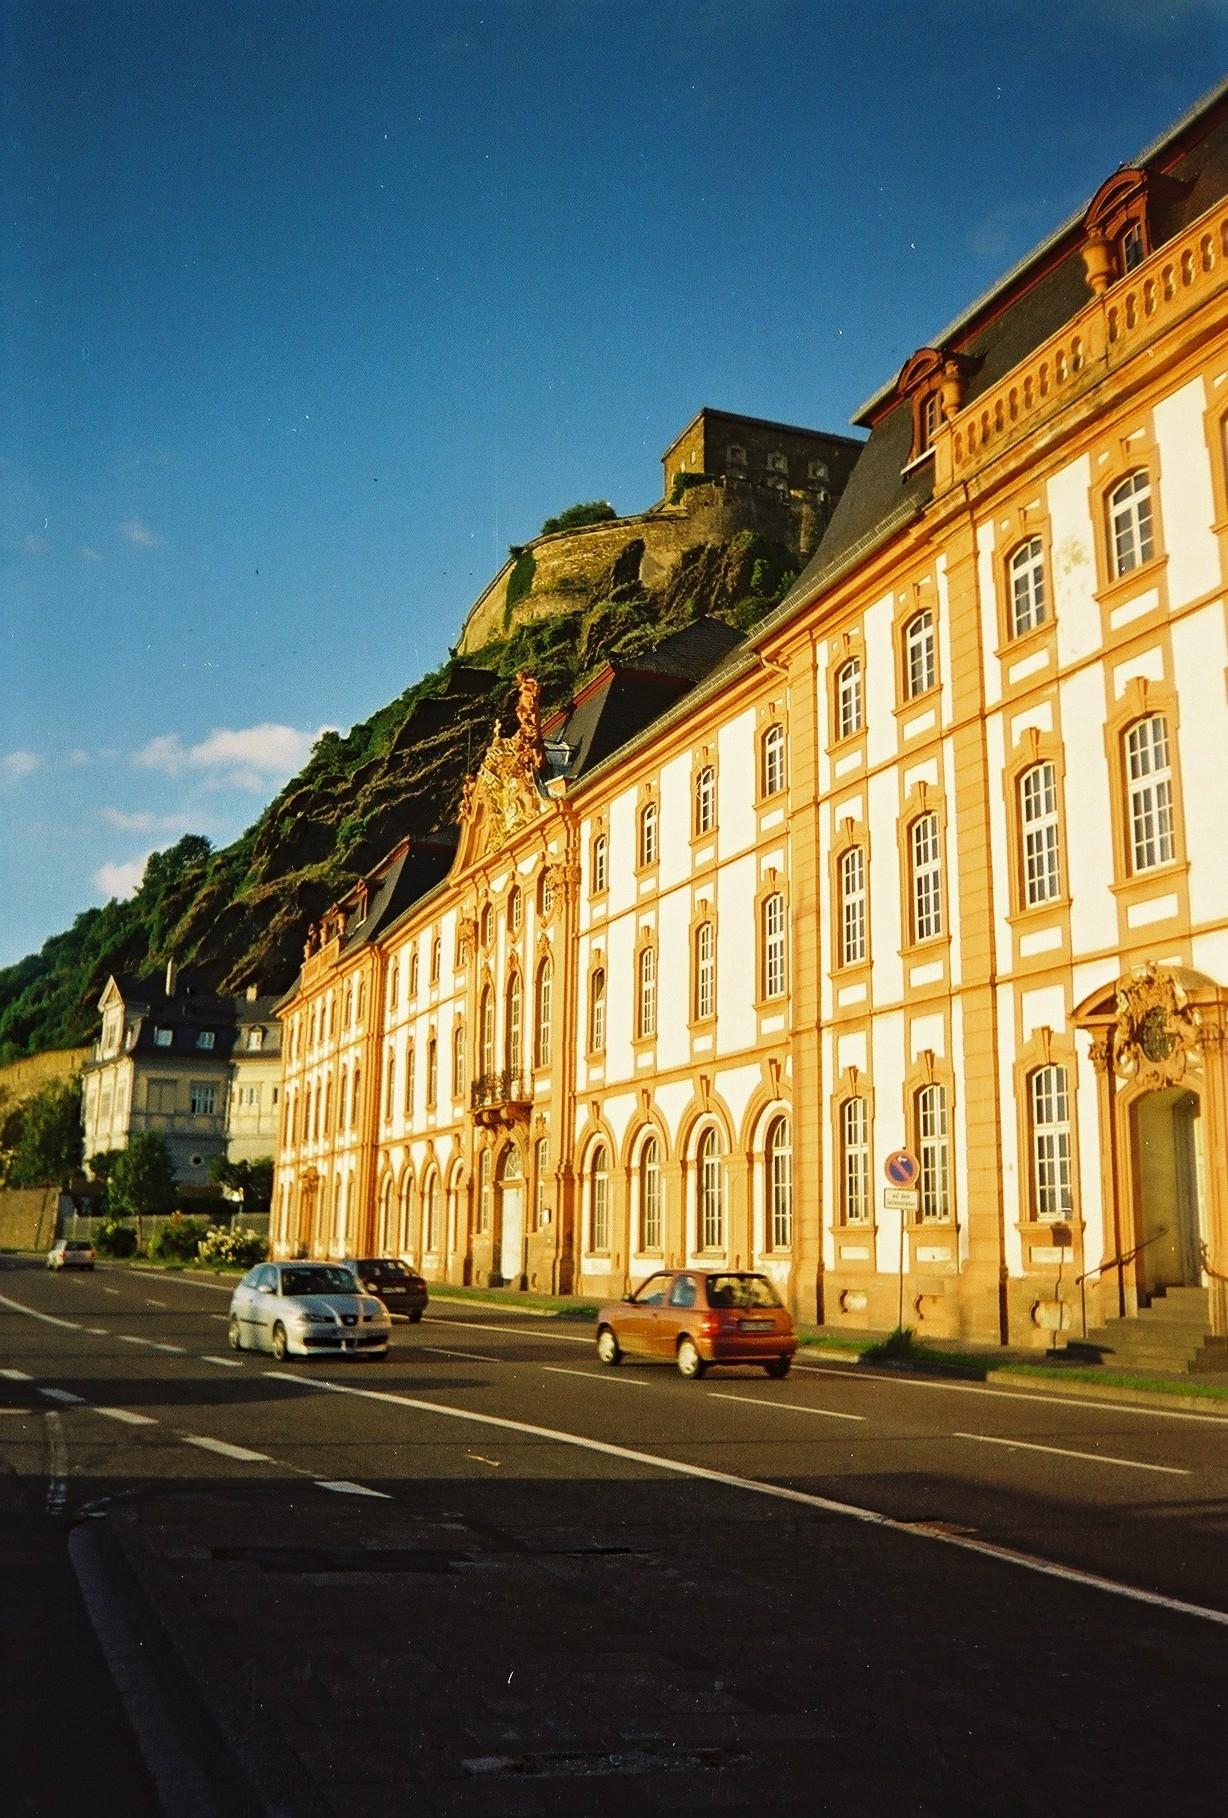 Huren aus Koblenz